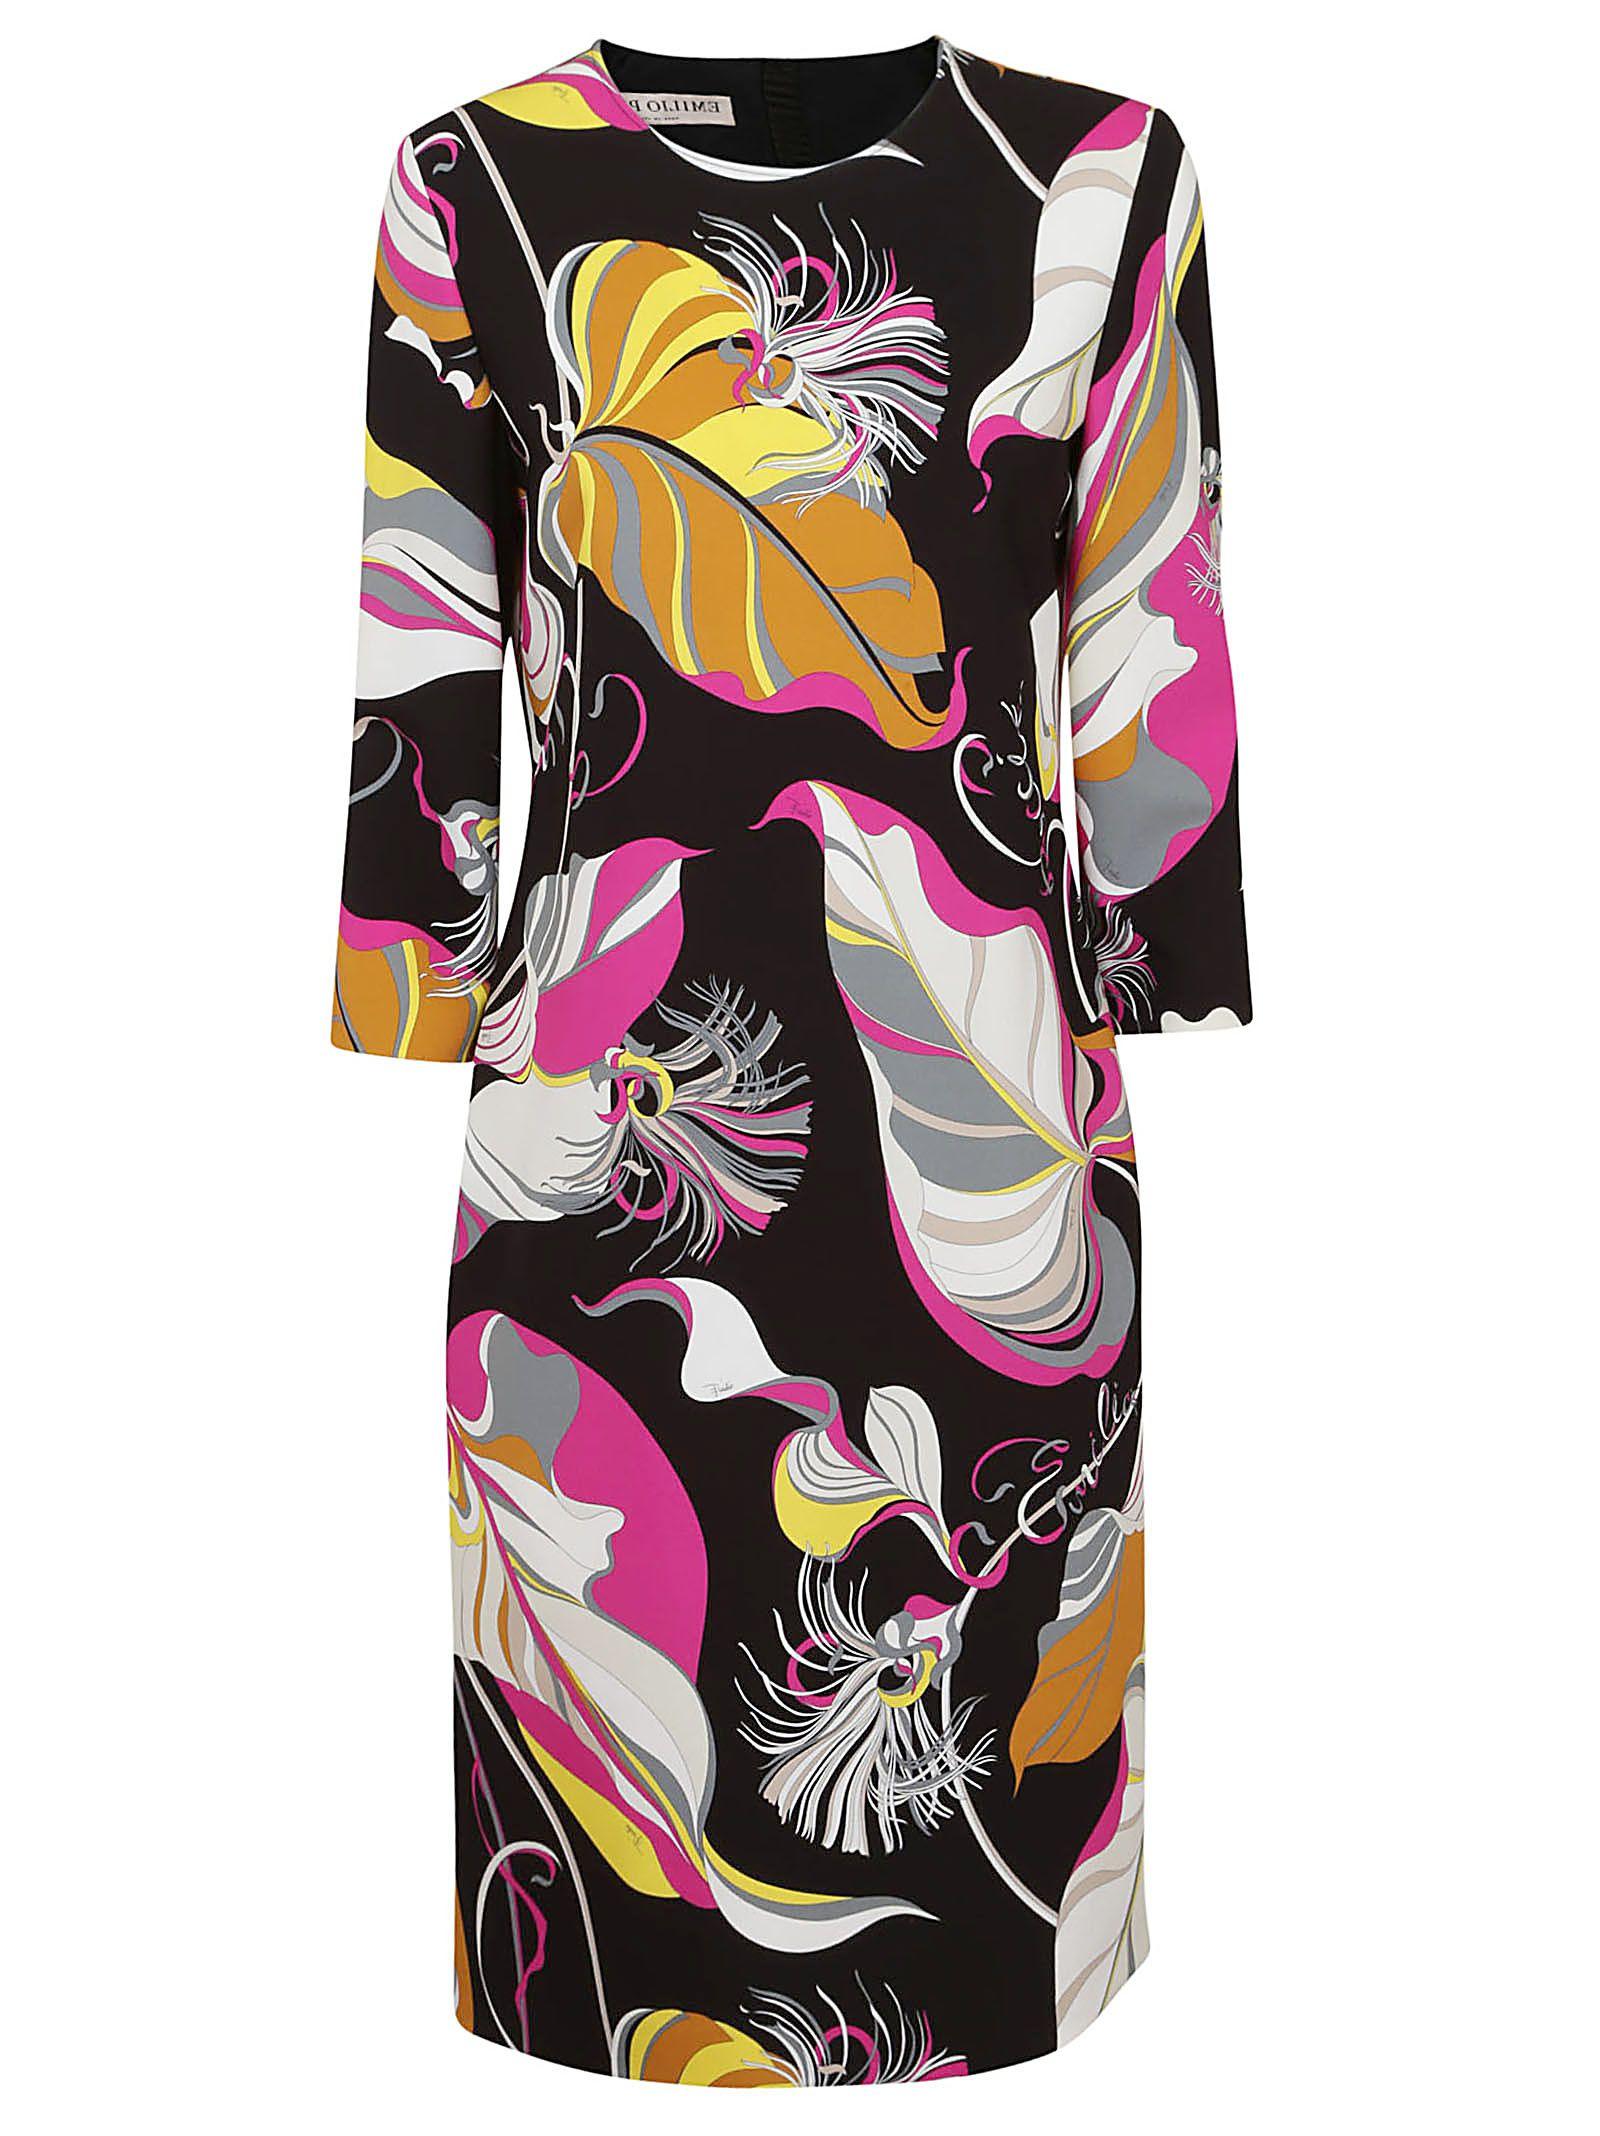 Emilio Pucci Leafy Print Dress